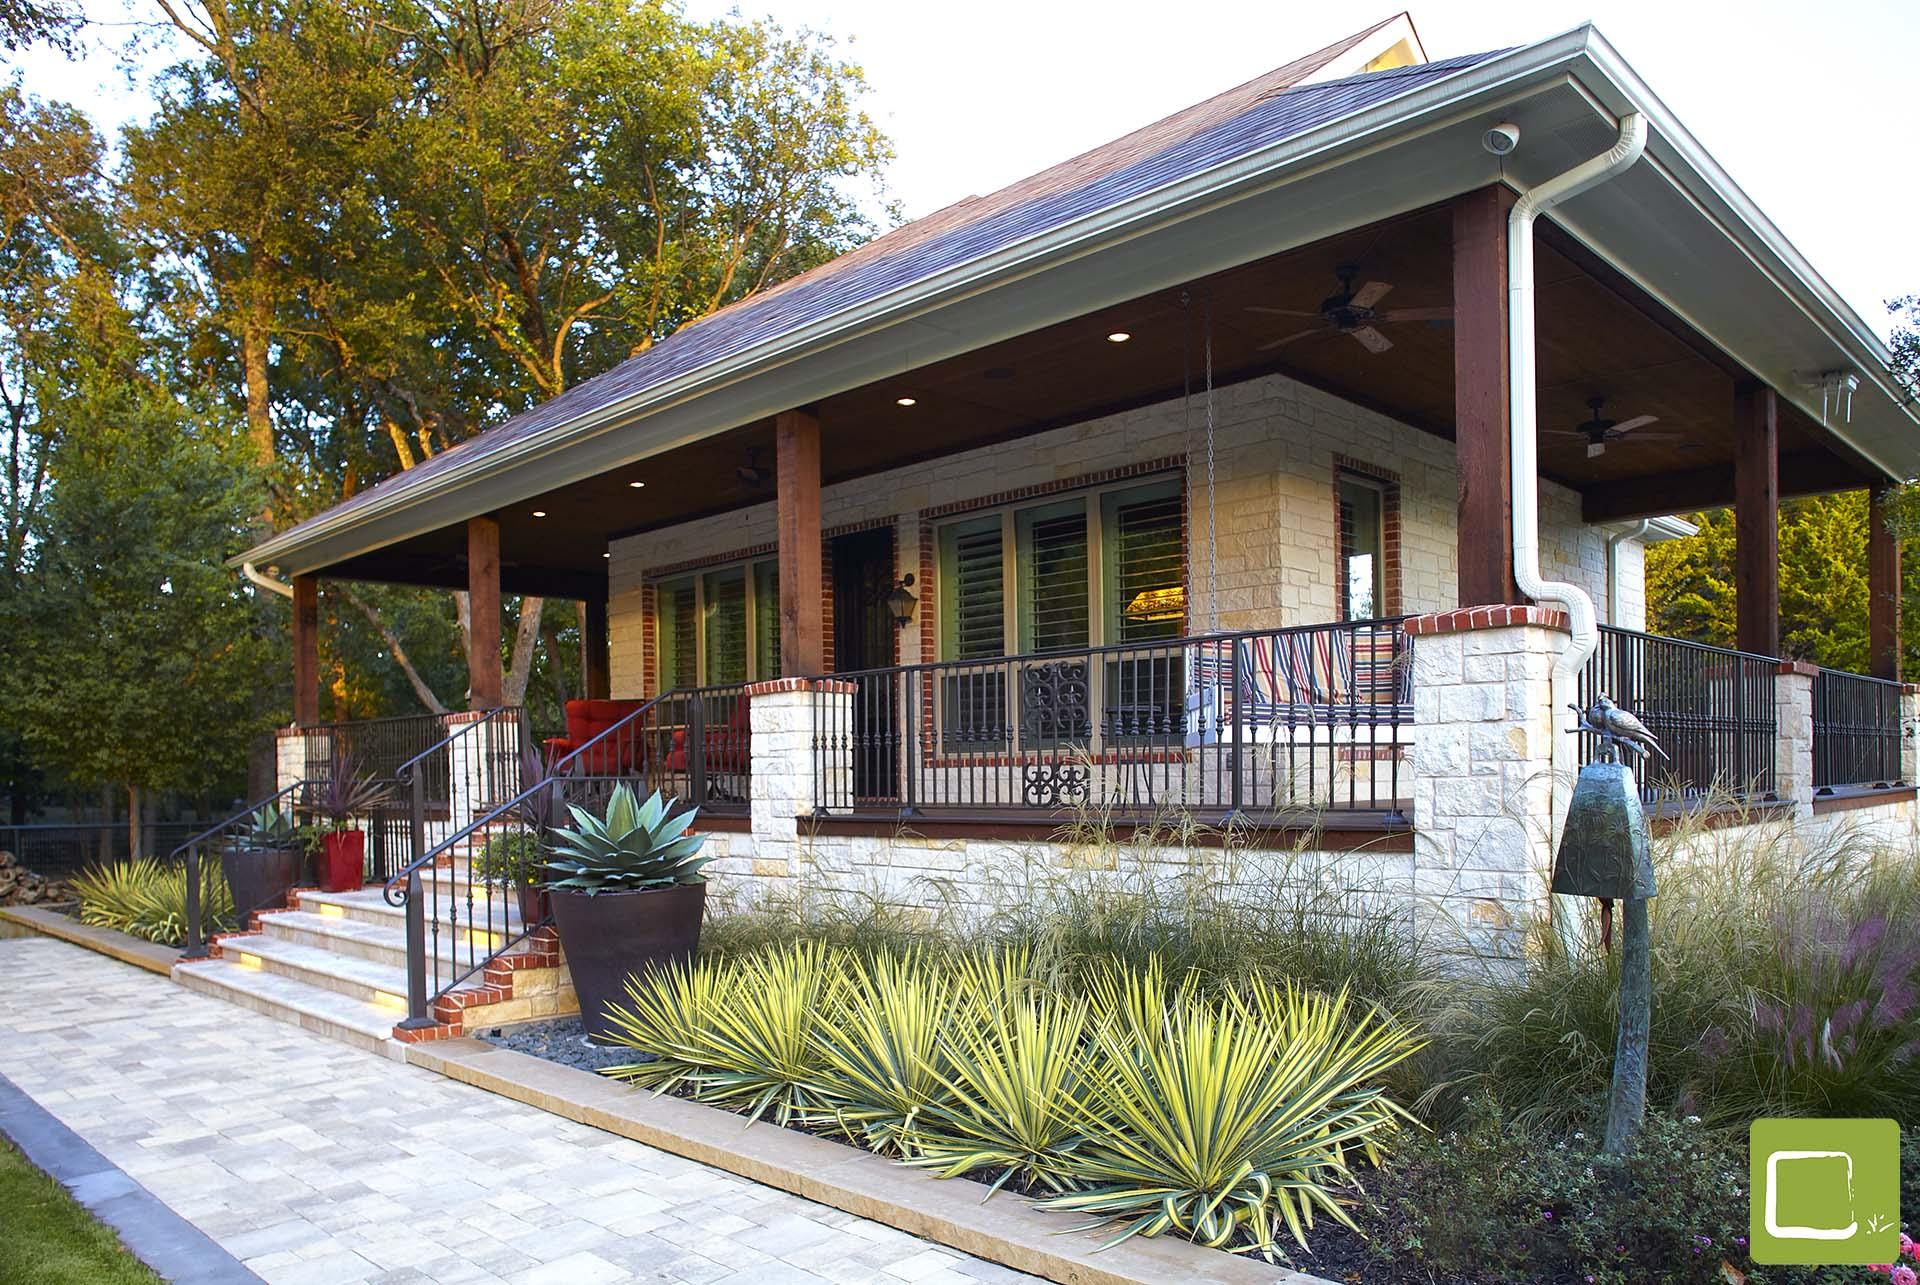 Dallas Landscape Architect | Modern Ranch Pool | Original ... on ranch mansion designs, ranch country house designs, ranch patio designs, ranch living room designs, ranch bunkhouse designs, ranch garden designs,